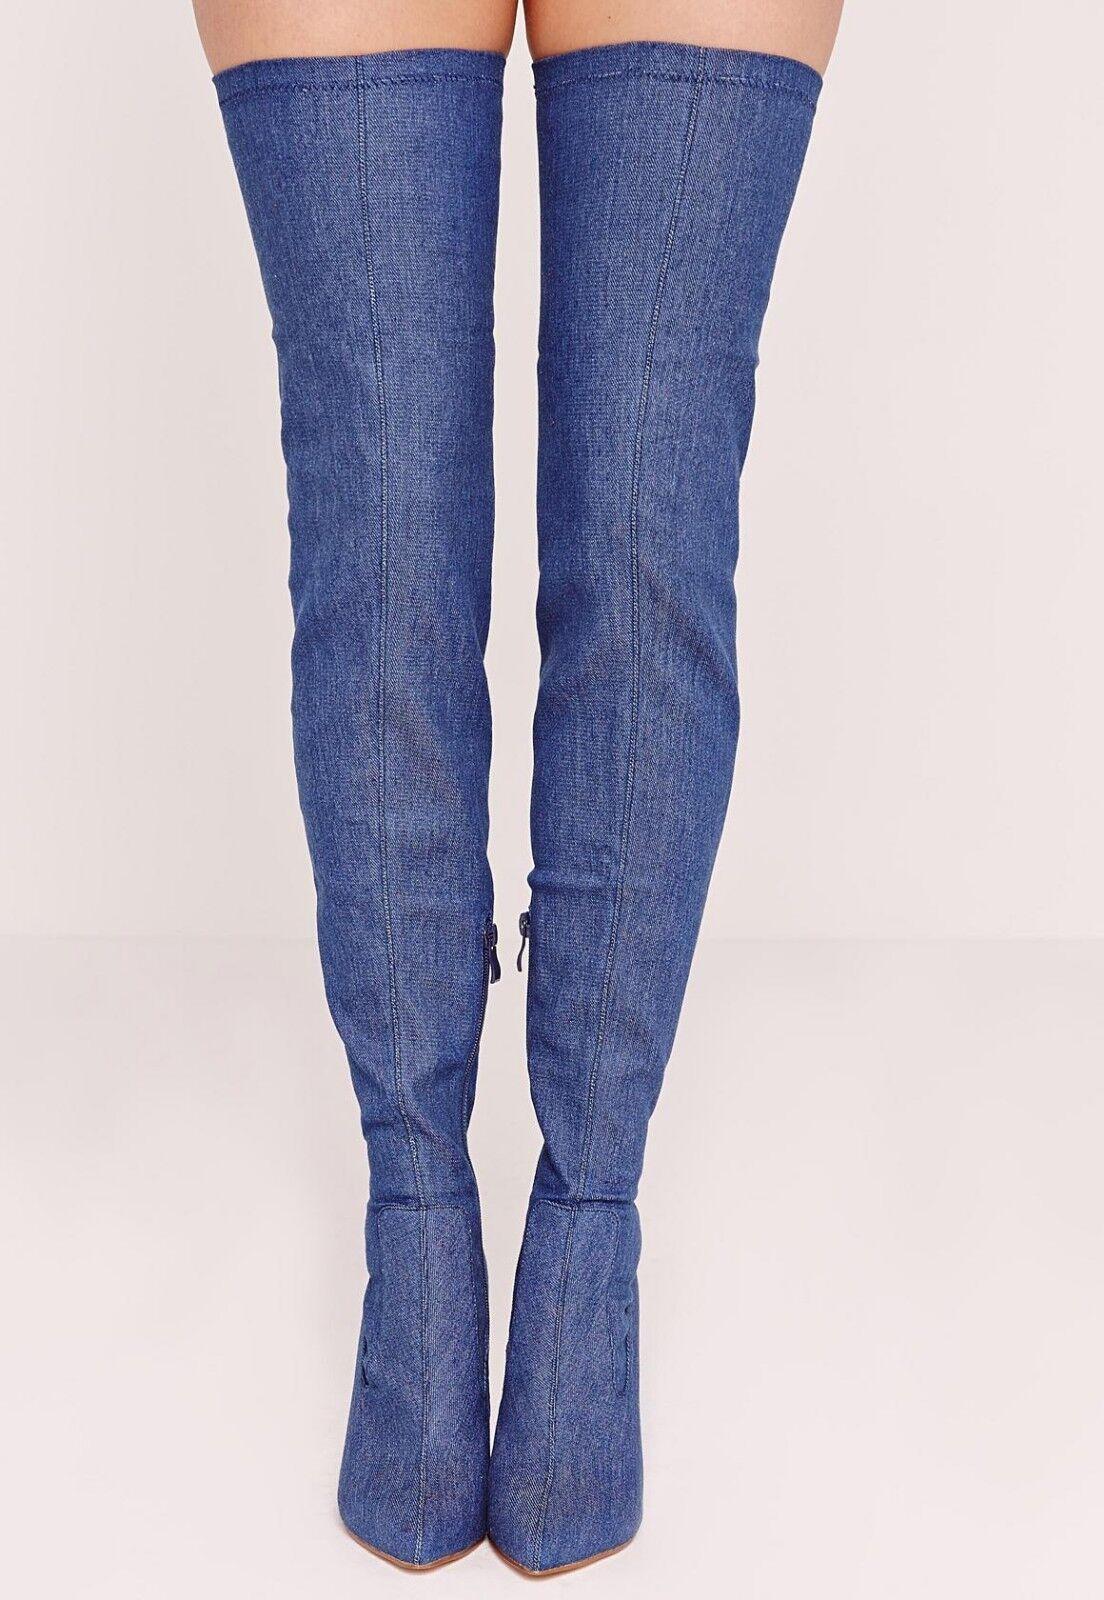 Missguided Over the Knee Denim  Stiefel Größe 6/39 BNWT  Denim  Blau Uk Freepost 670e94